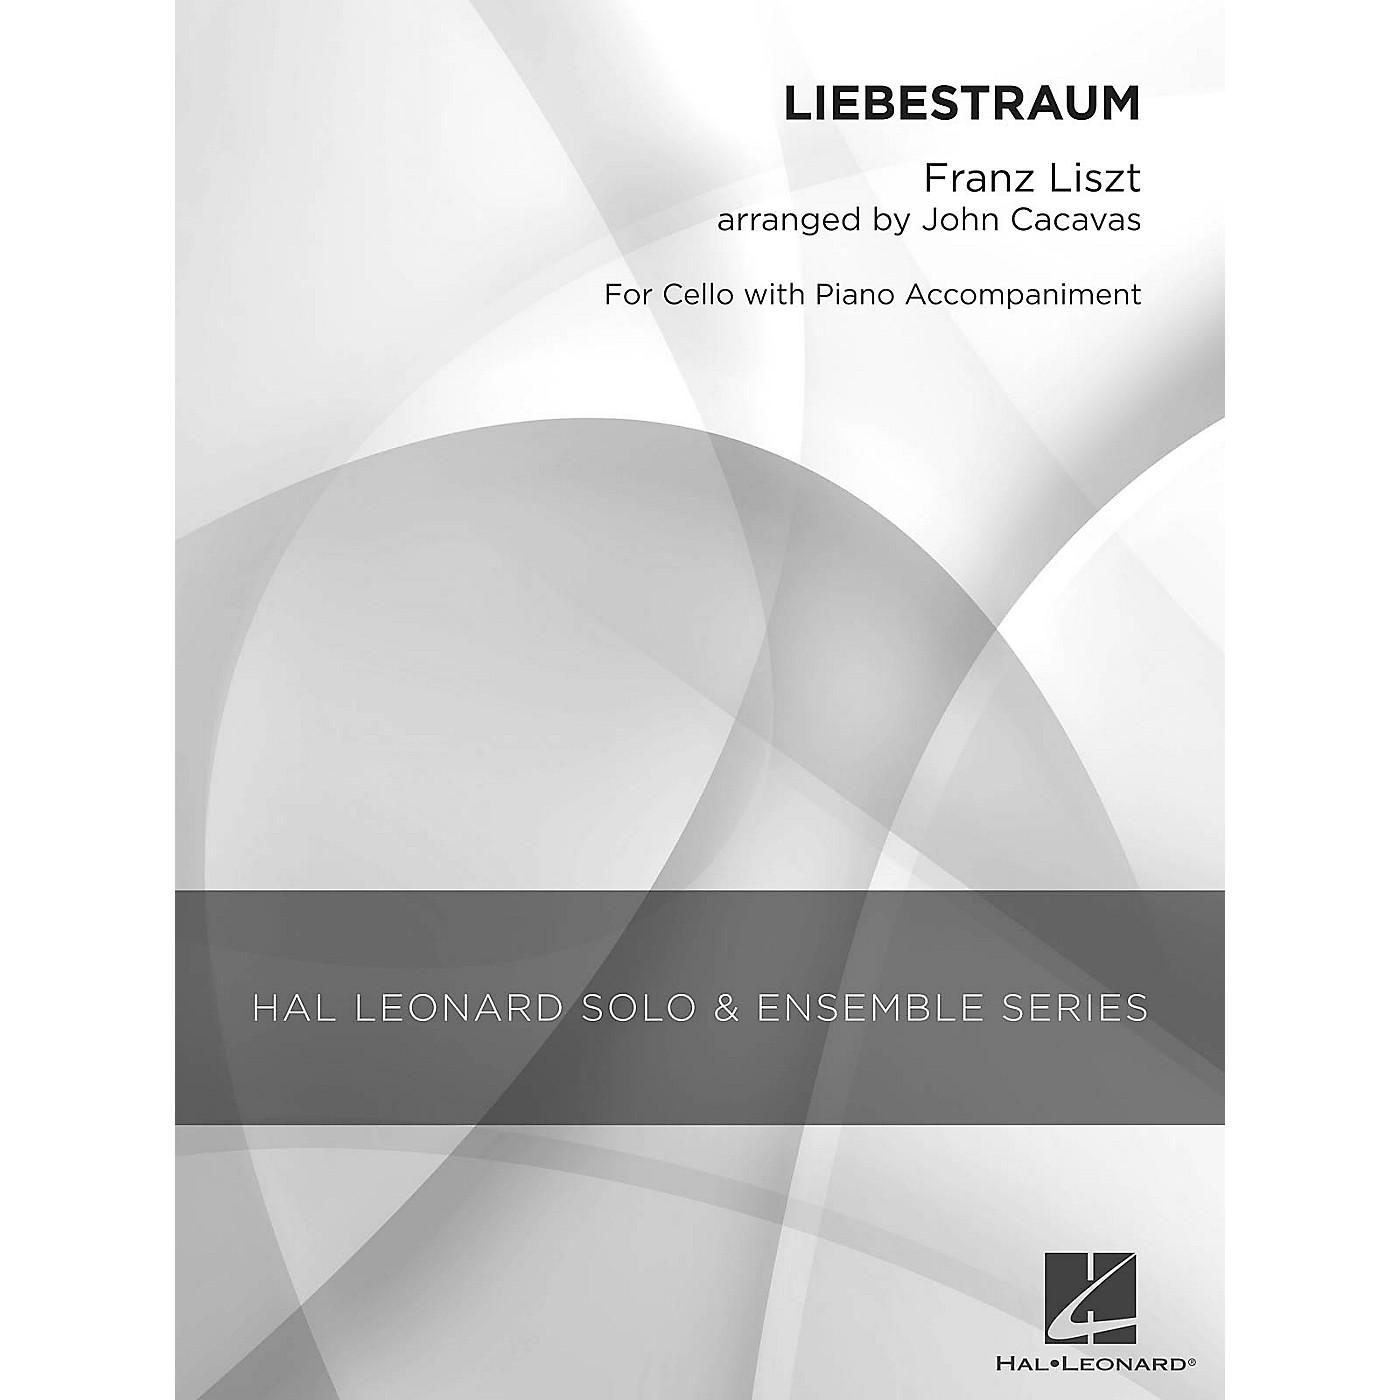 Hal Leonard Liebestraum (Grade 2 Cello Solo) Hal Leonard Solo & Ensemble Series Arranged by John Cacavas thumbnail